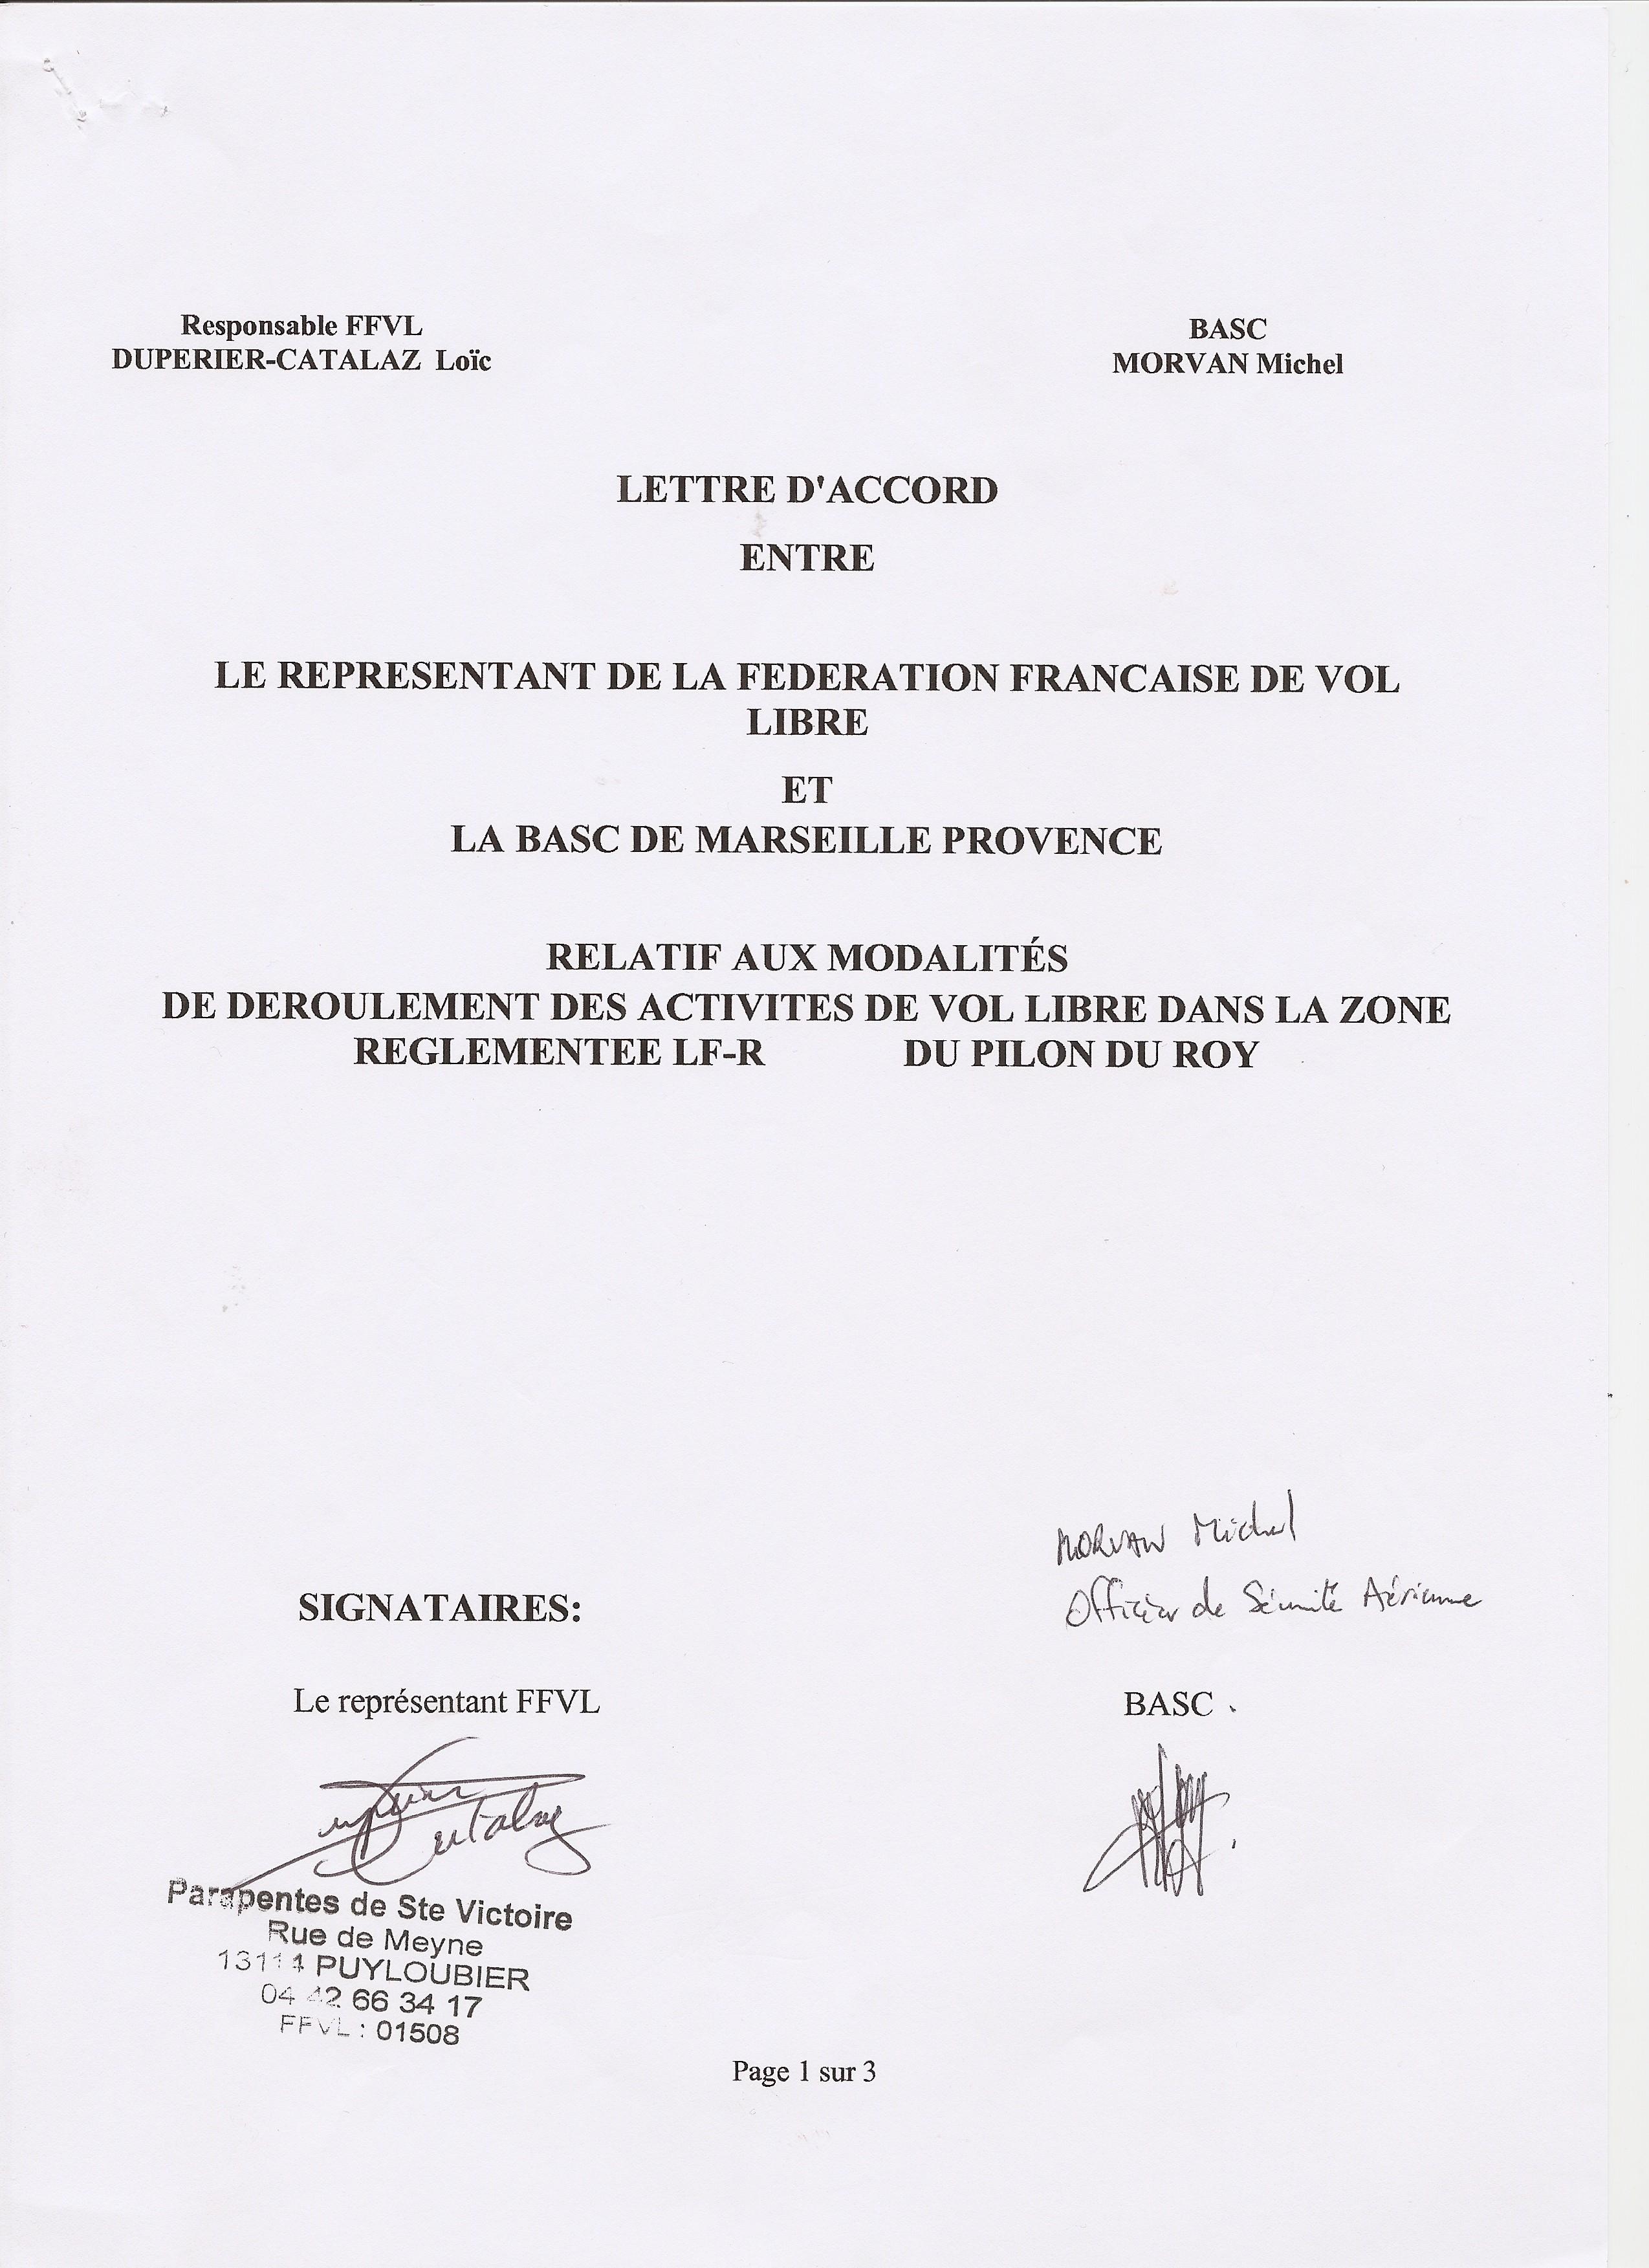 http://loicduperier.free.fr/parapente_blog/Lettre%20d%27accord%20BASC%201.jpg